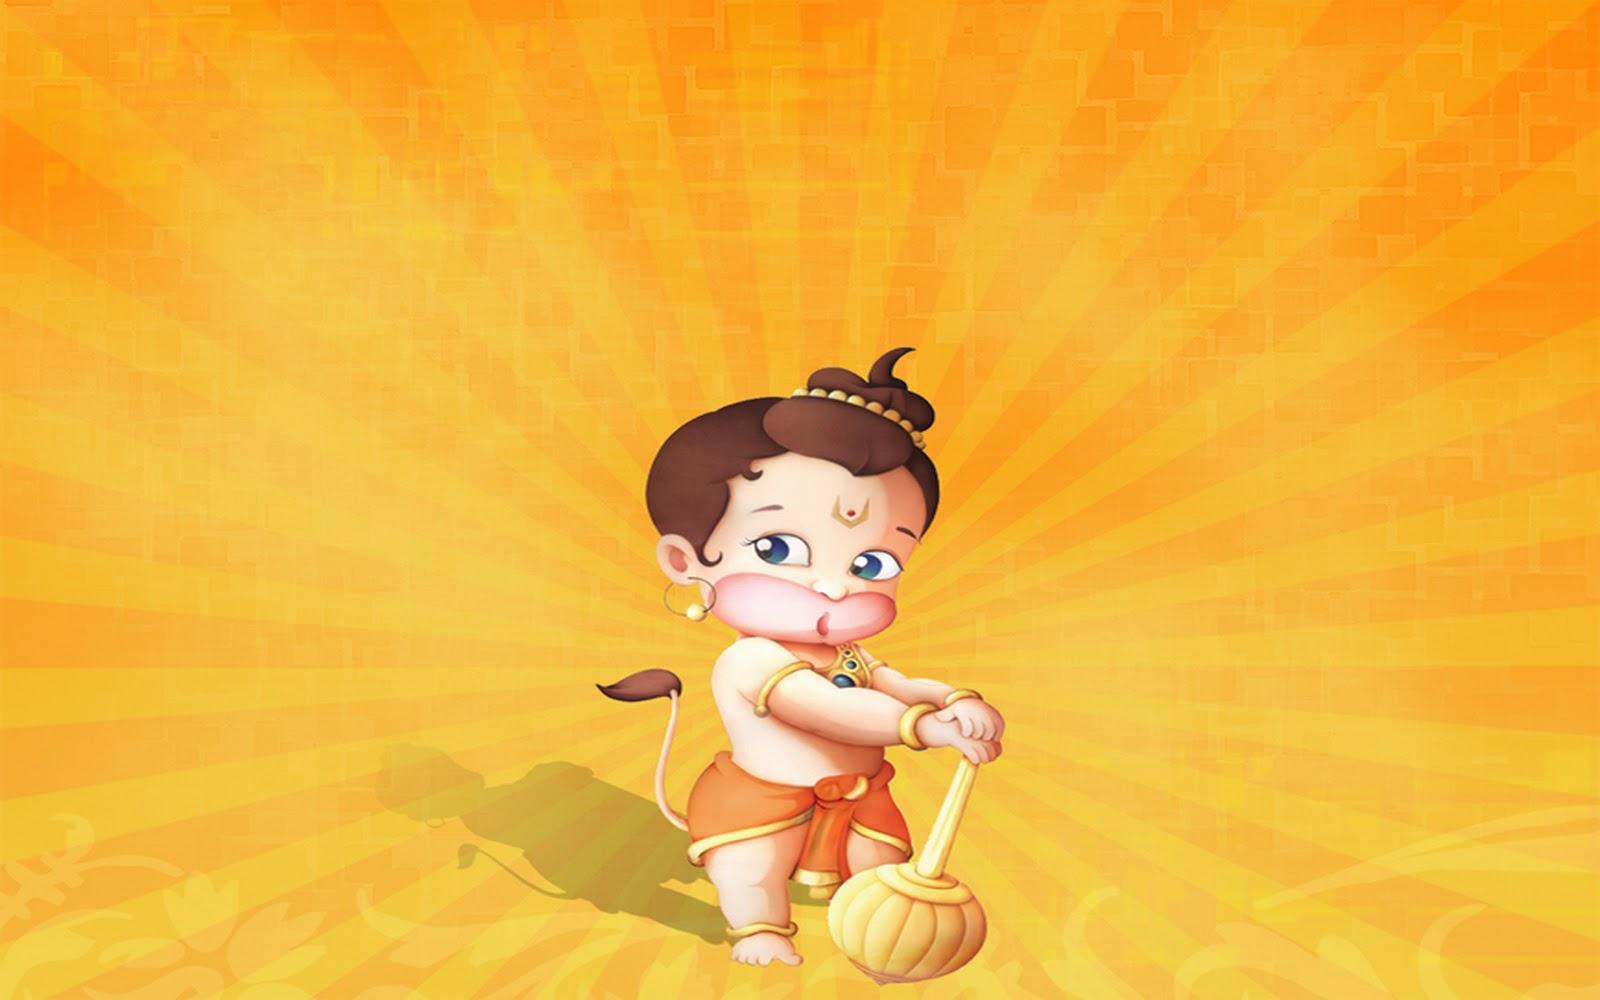 http://4.bp.blogspot.com/_WOWQJUlRtKQ/TRObhcr_qNI/AAAAAAAABCA/UMuUcN0ZZWA/s1600/Panchmukhi+Hanuman+Wallpaper+13.jpg